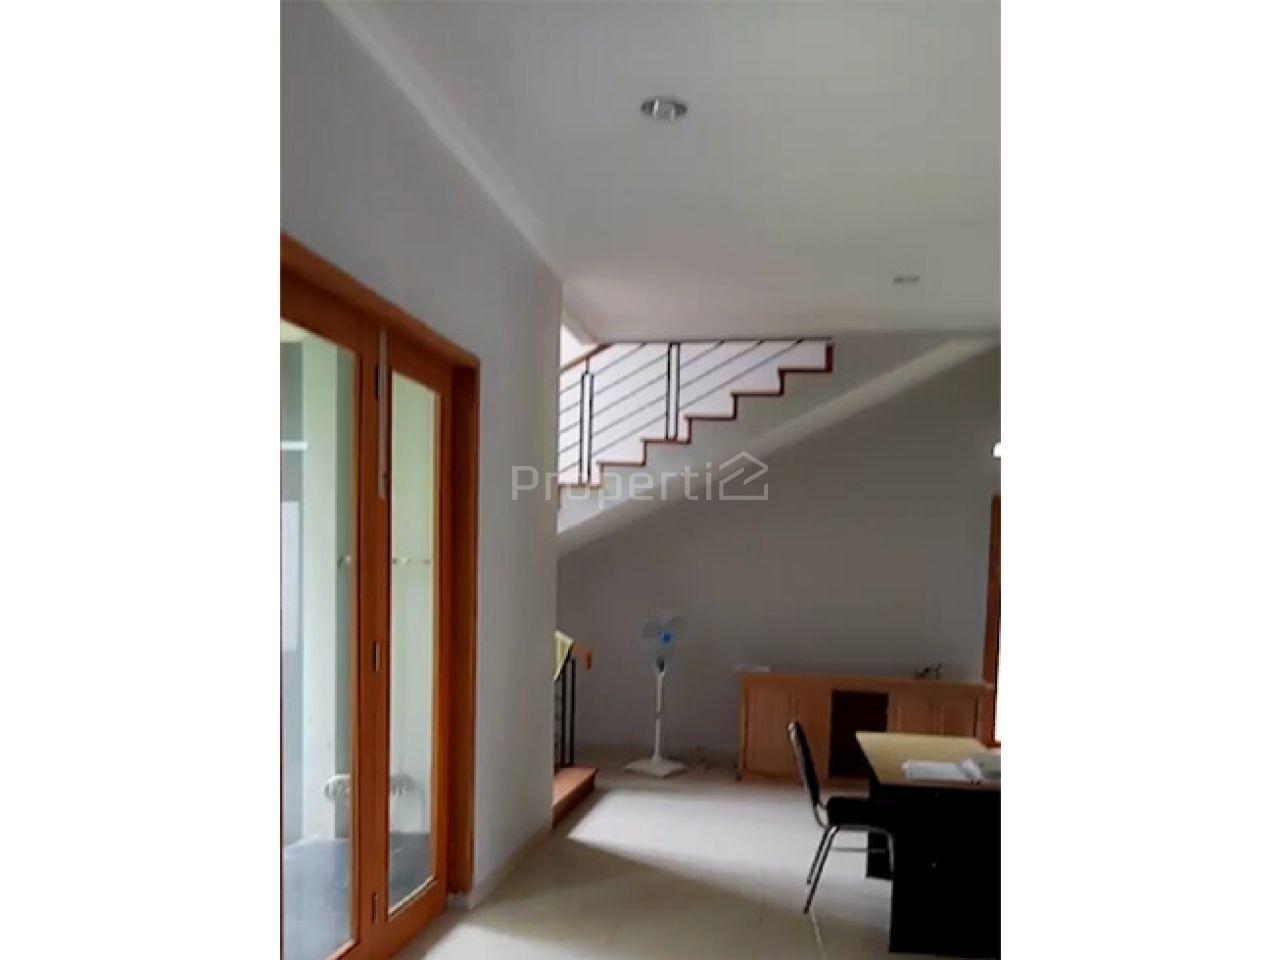 Rumah Baru Modern dalam Kompleks Elite di Yogyakarta, Di Yogyakarta